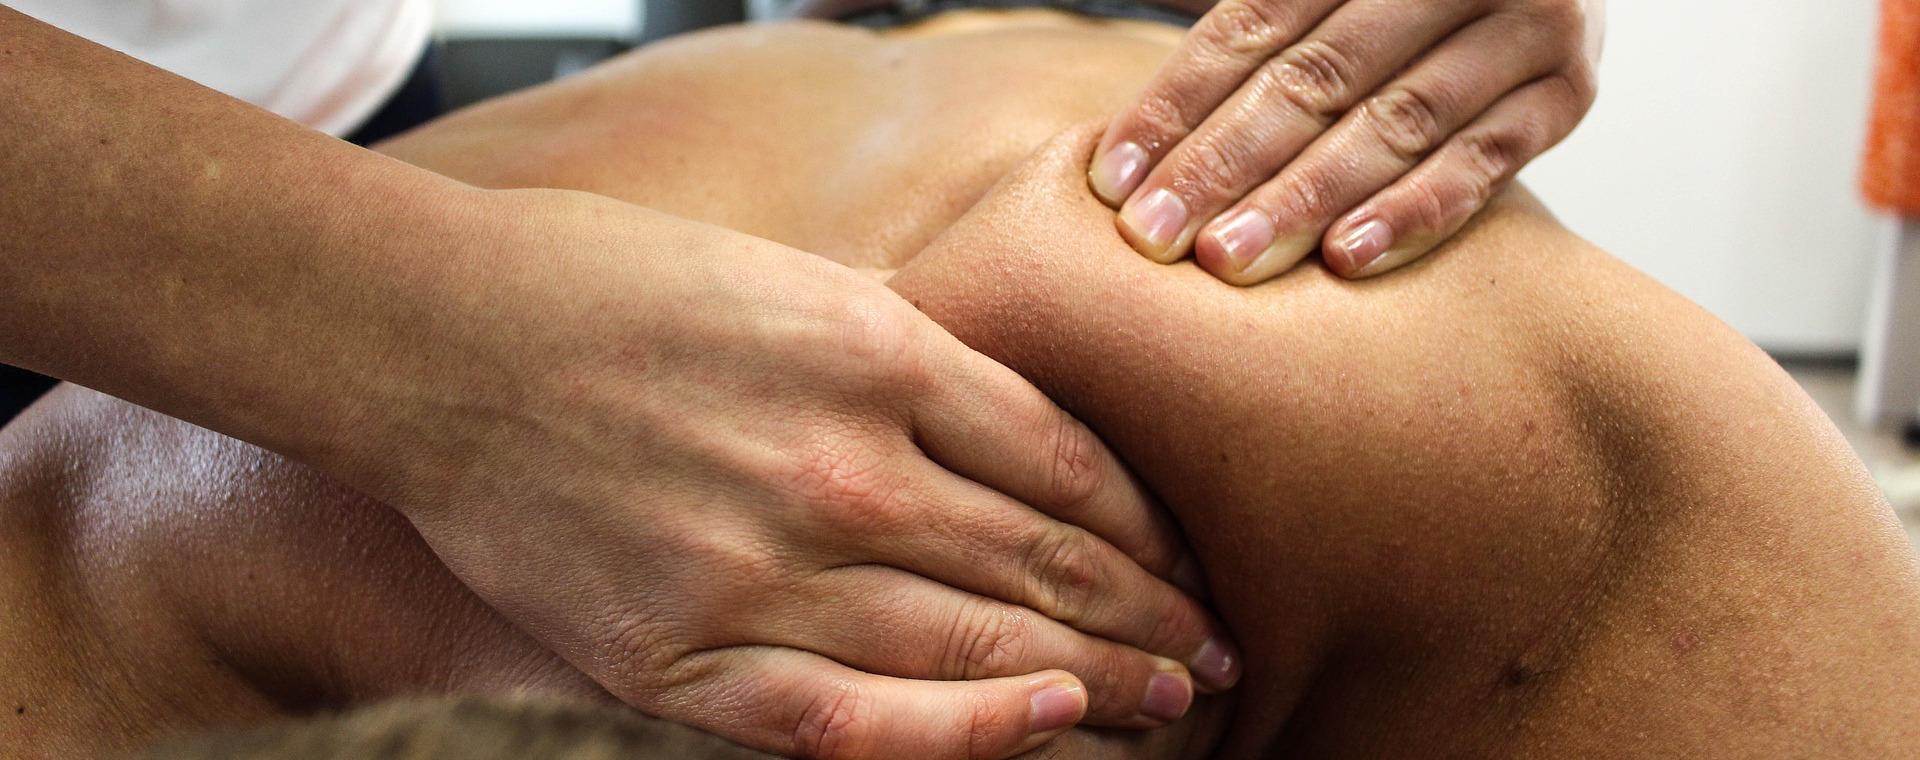 inga-pokora-heilpraktiker-massage